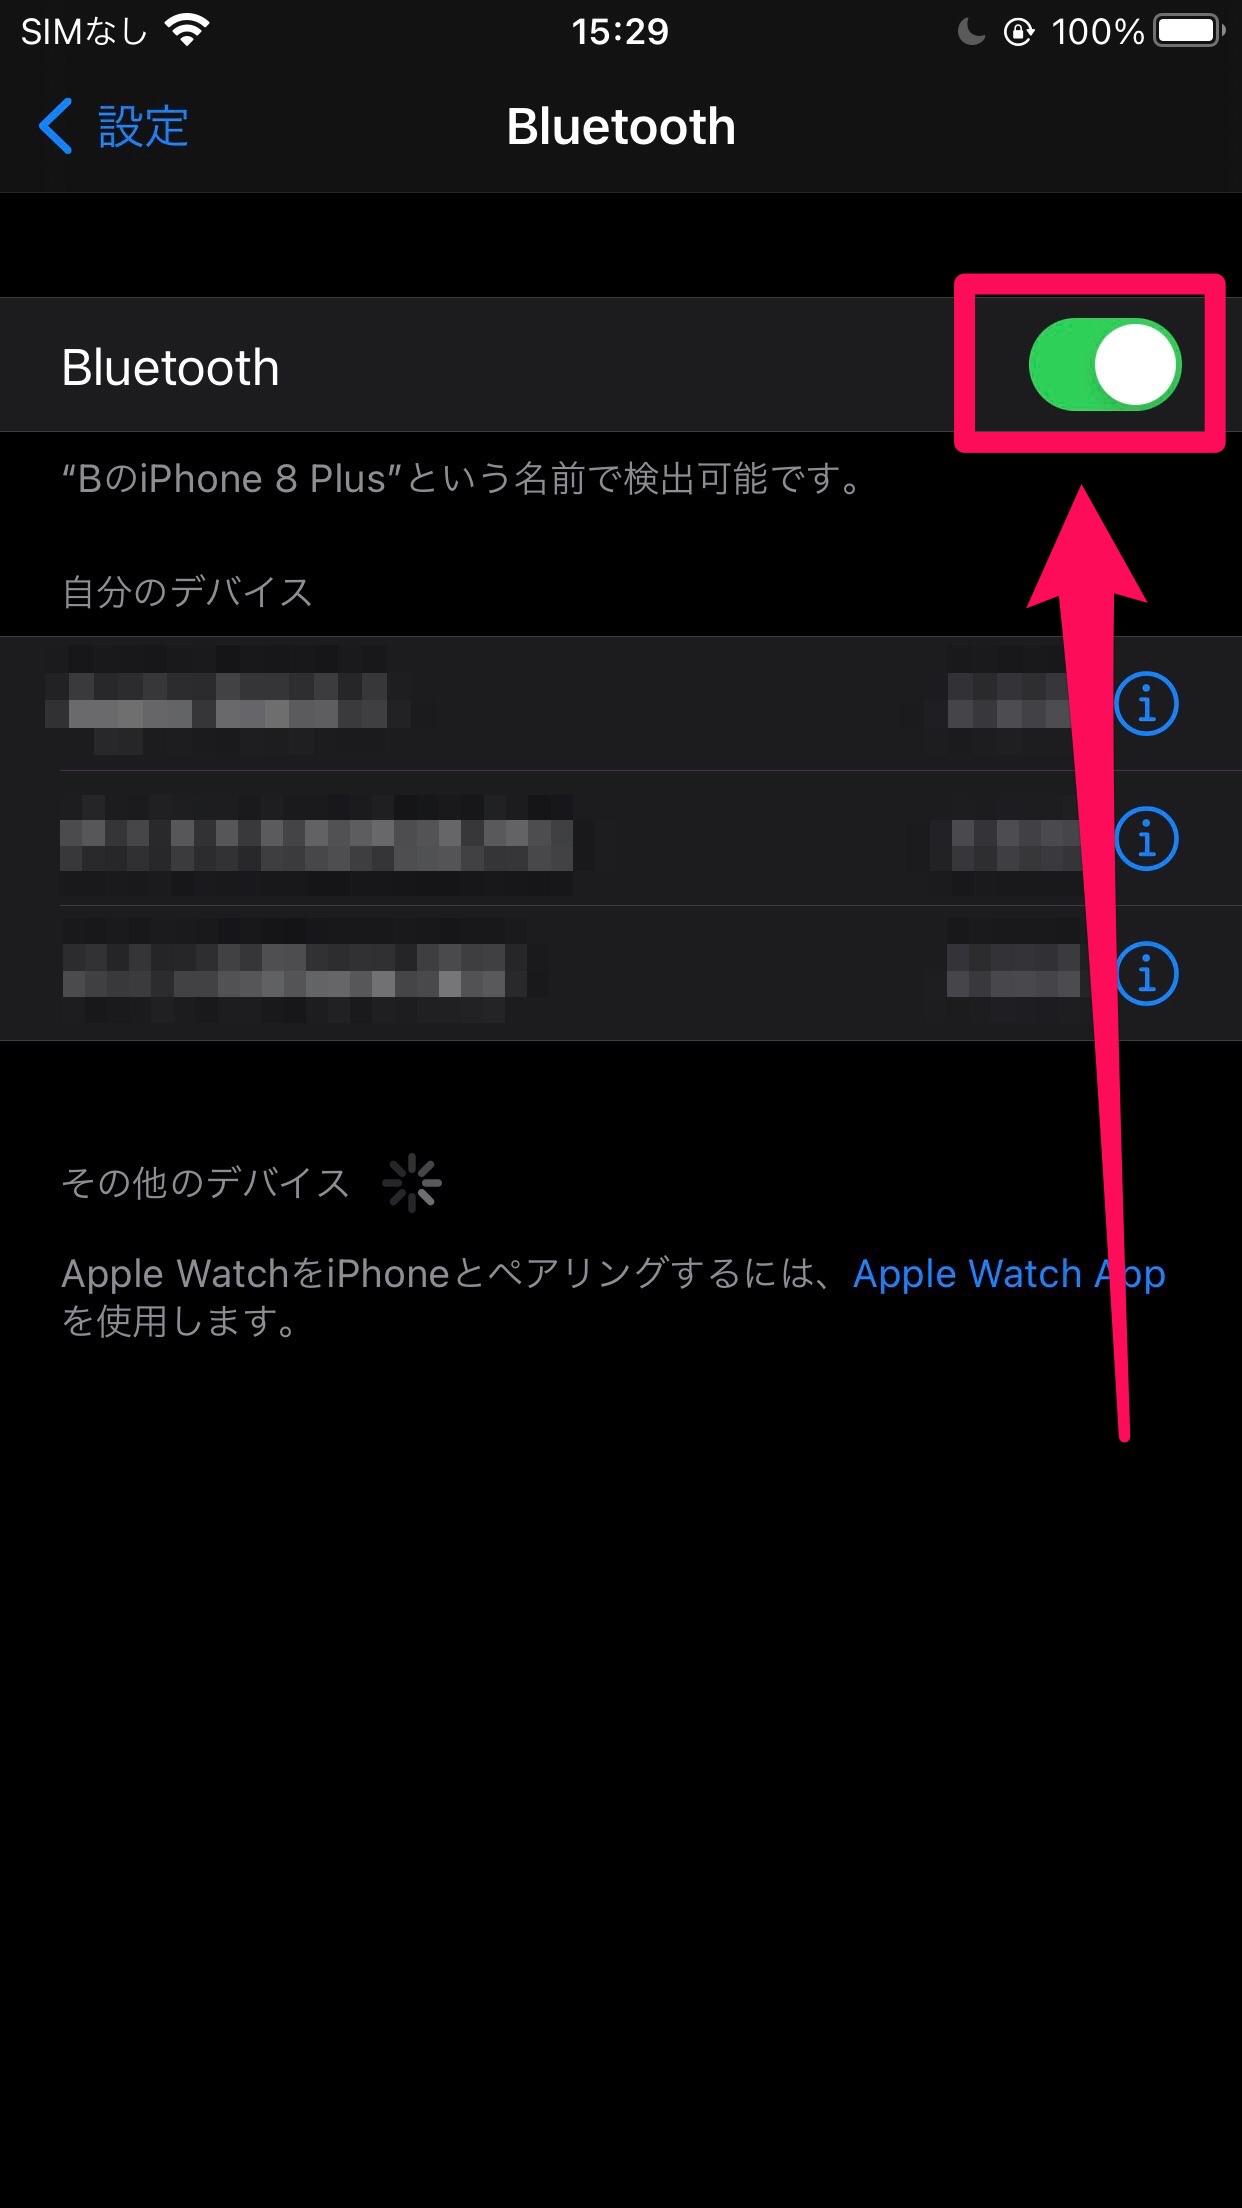 iPhoneのBluetooth設定